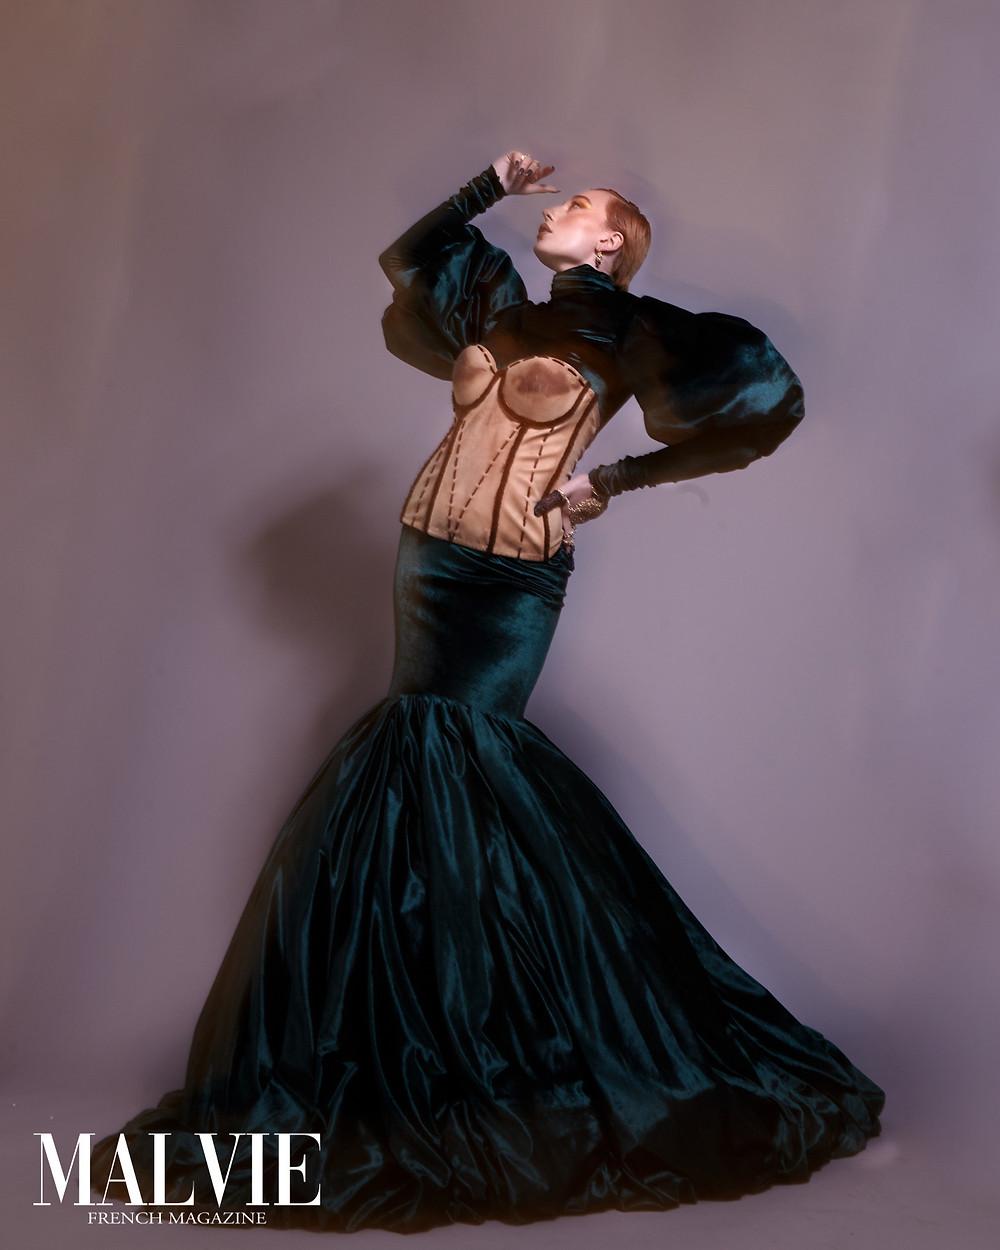 Photo: @sdc.photographique Stylist: @elliarnnaalicia MUA: @natasha_de_cazalet Model: @katiehodgson_ Via @officialkavyar